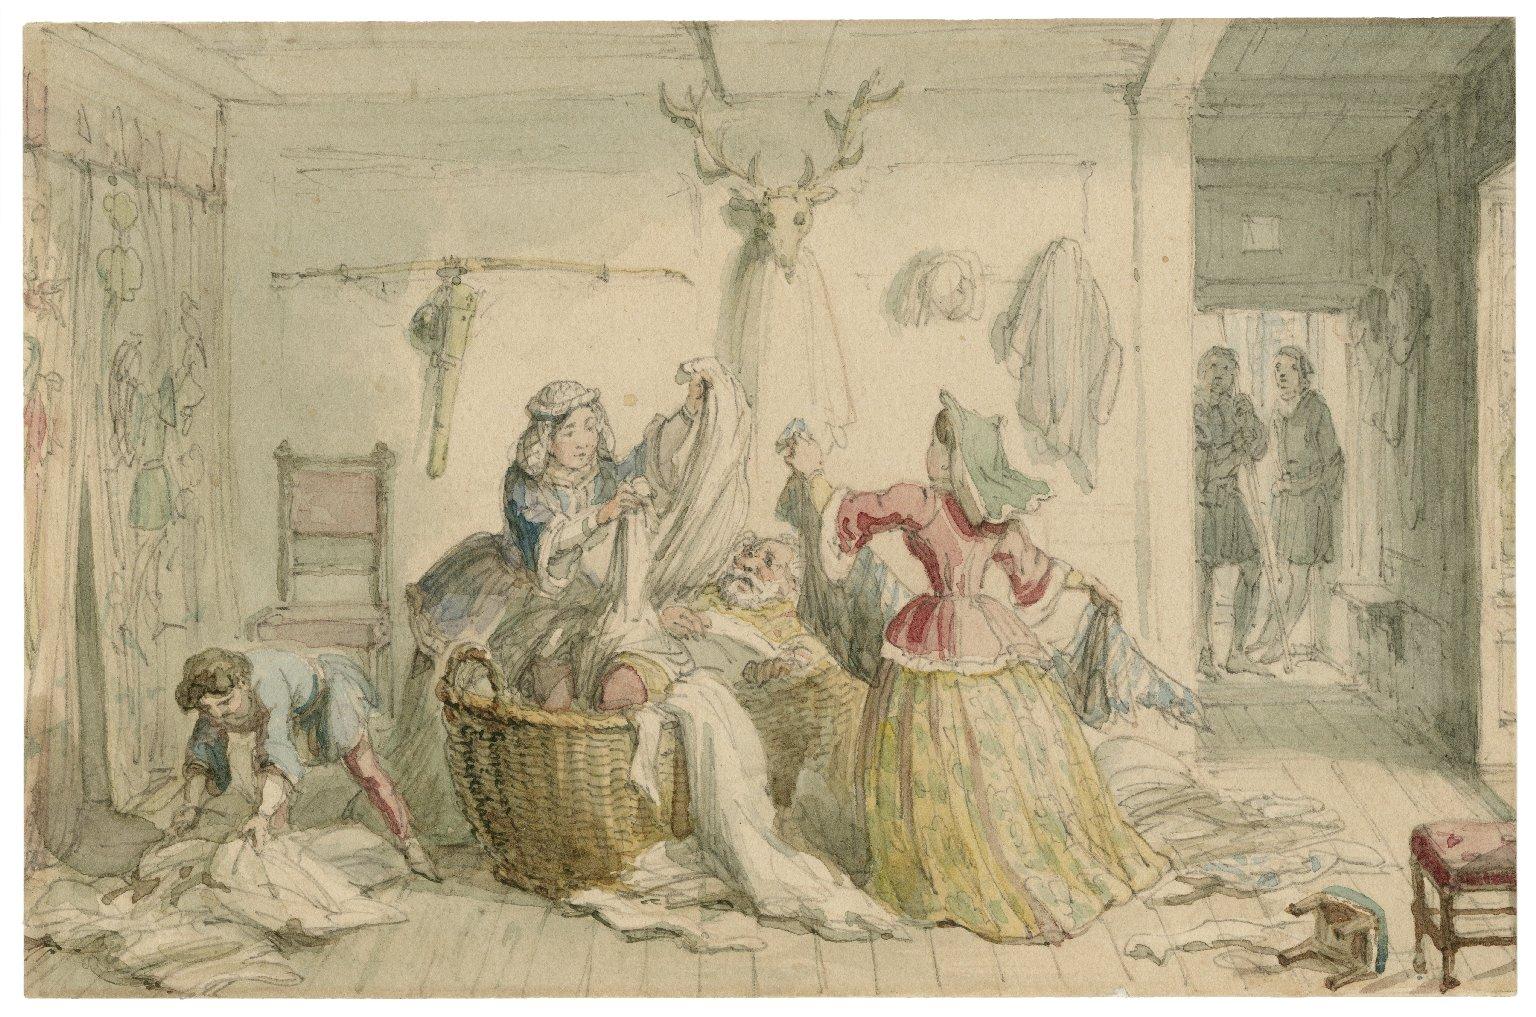 [Merry wives of Windsor, III, 3, Sir John Falstaff in the buck basket] [graphic] / [George Cruikshank].